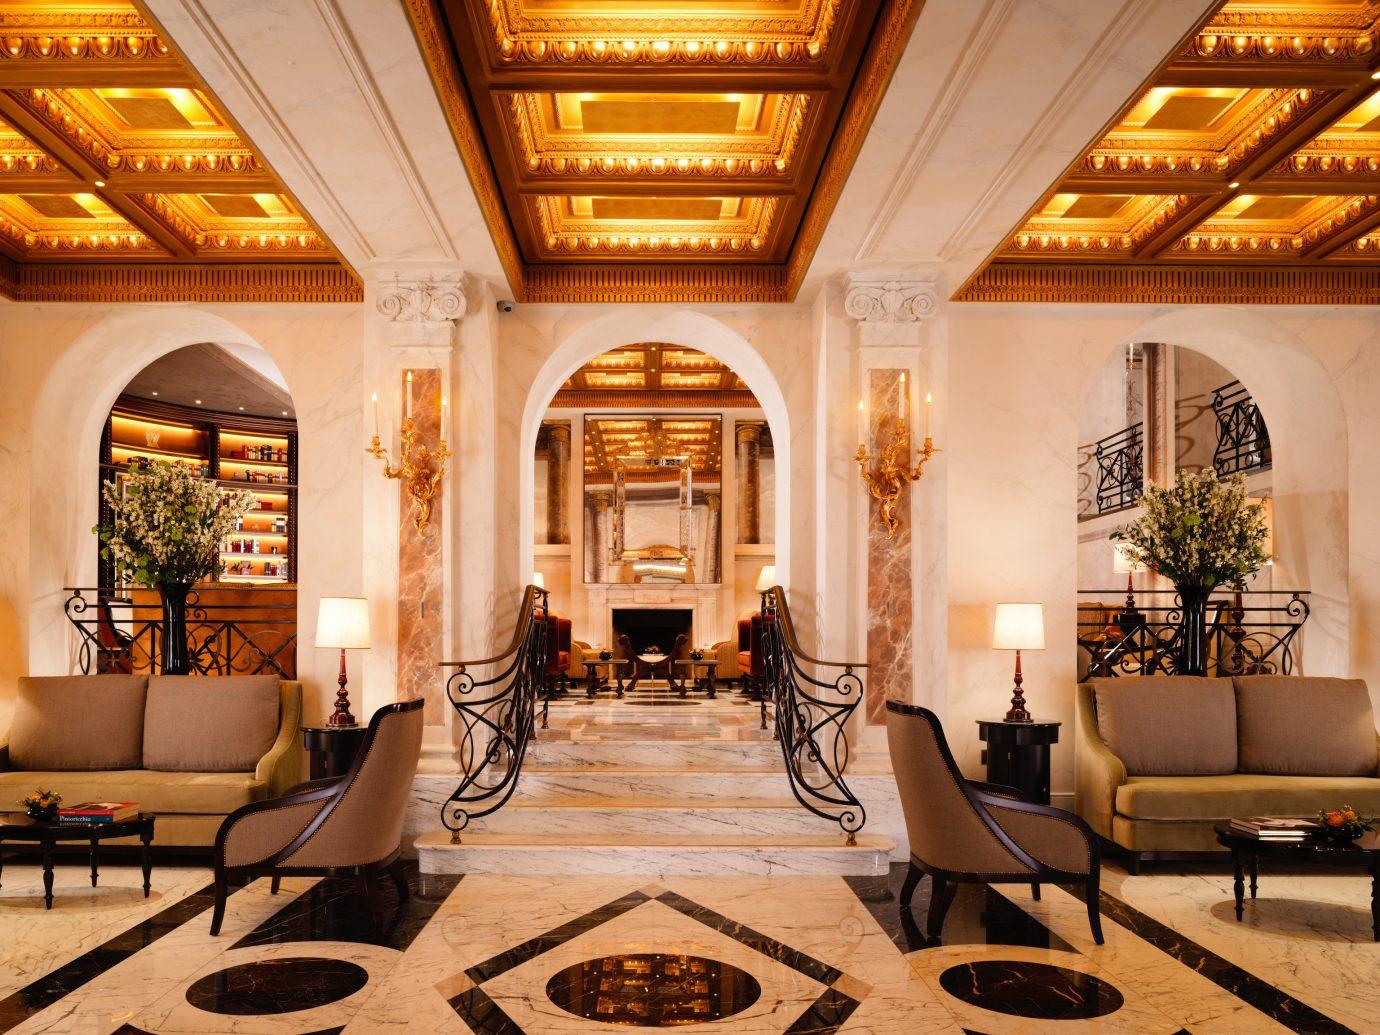 Boutique Hotels Hotels indoor room Lobby ceiling interior design living room Living estate flooring furniture decorated